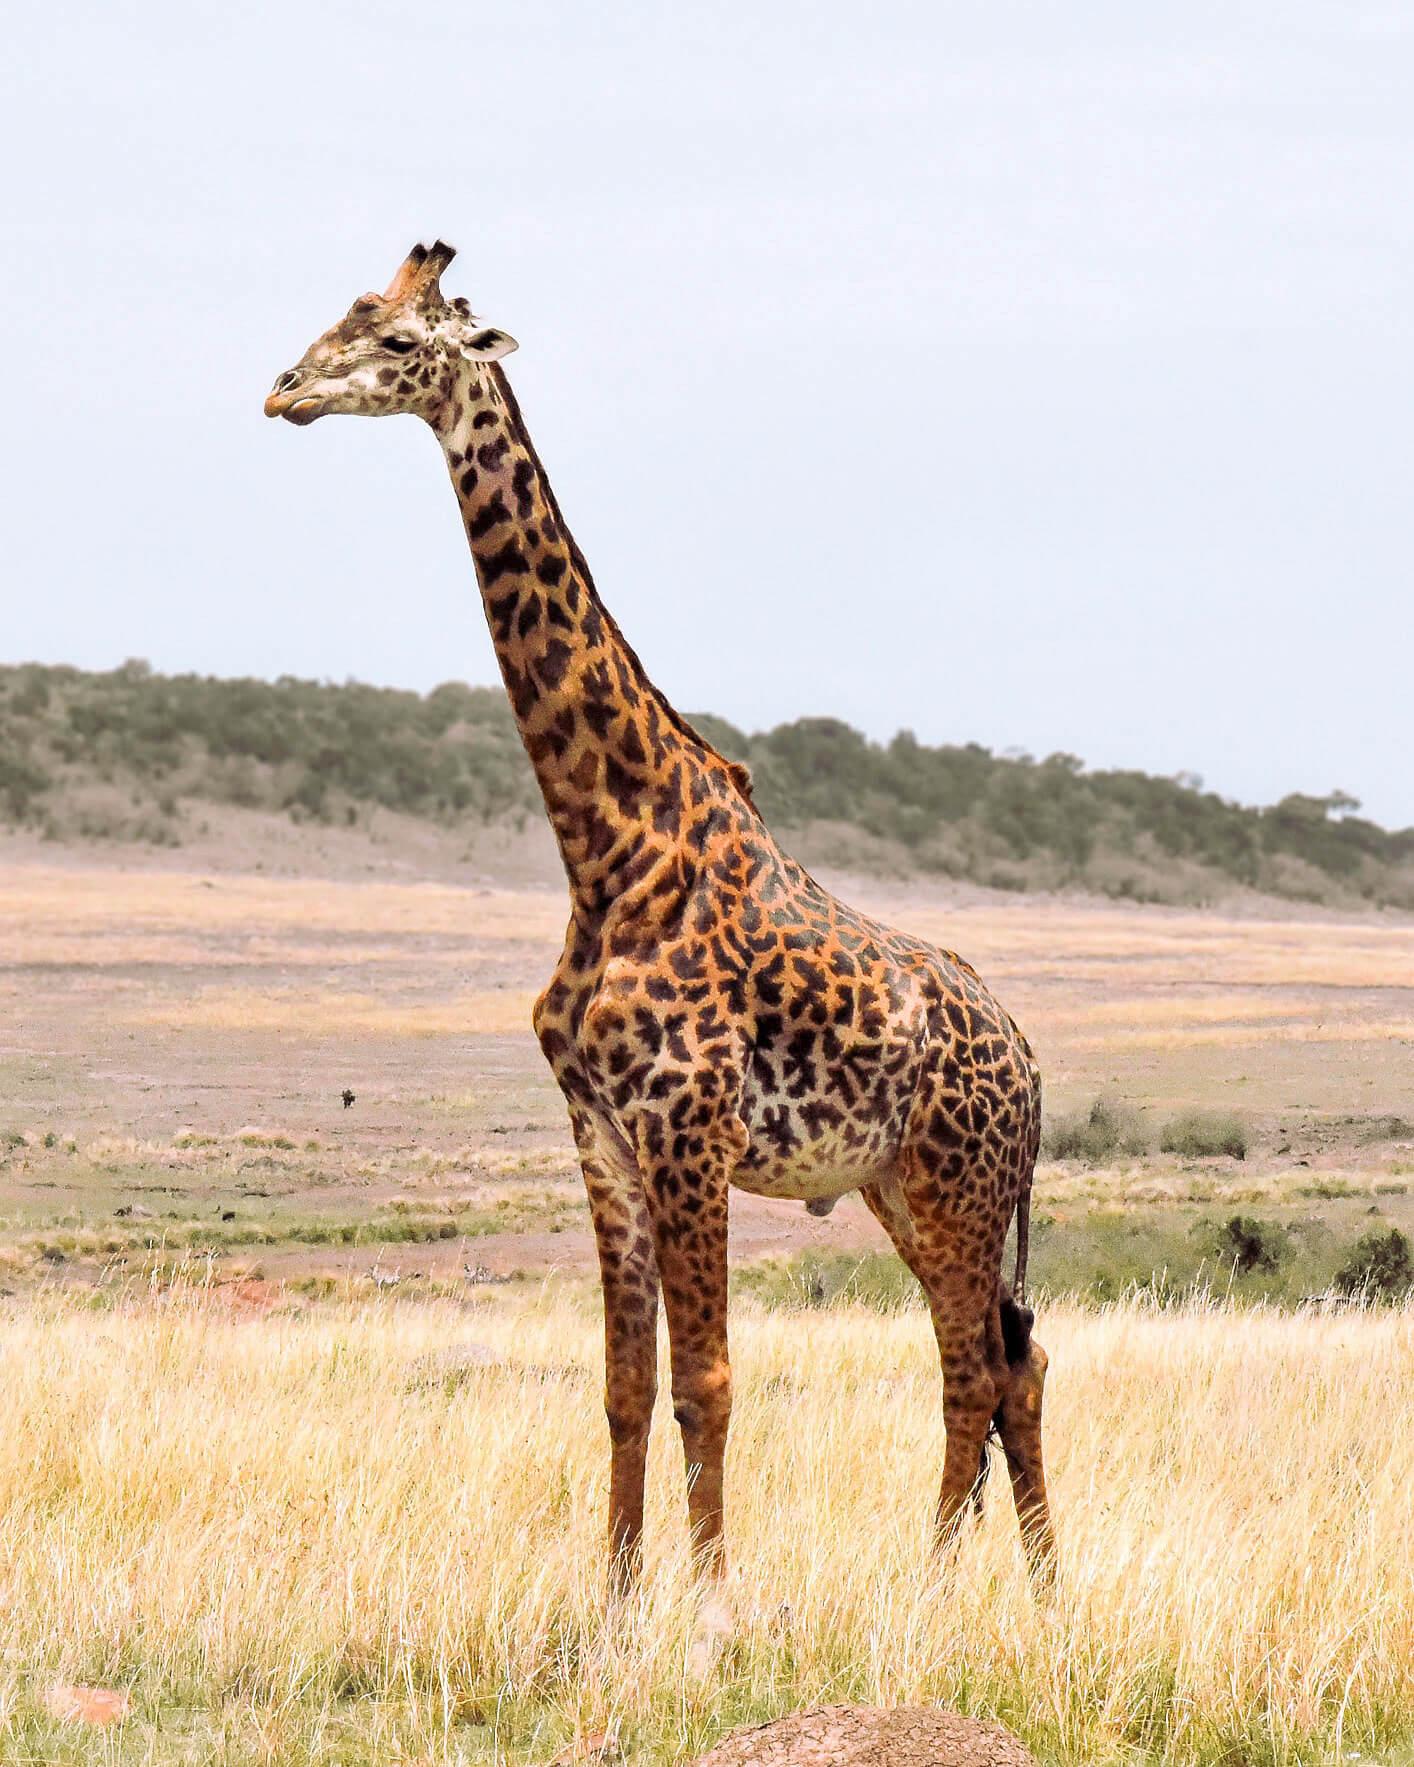 A huge male Giraffe standing in the savanna